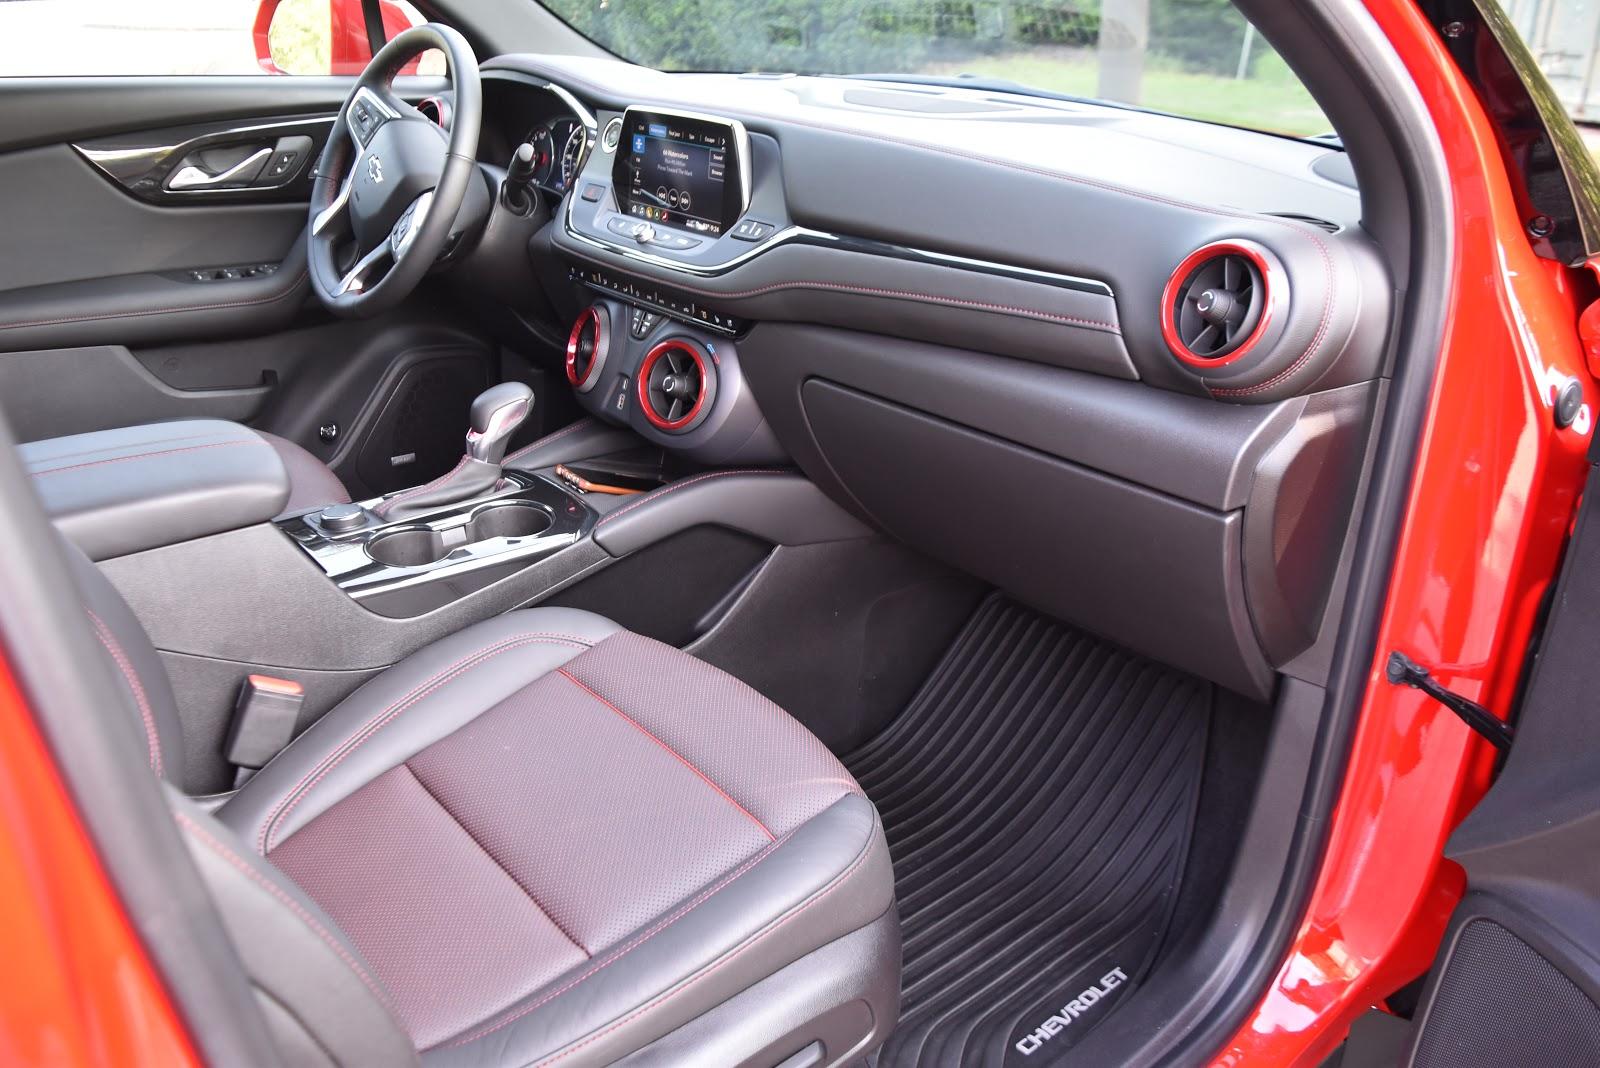 2019 Chevy Blazer Interior Seating